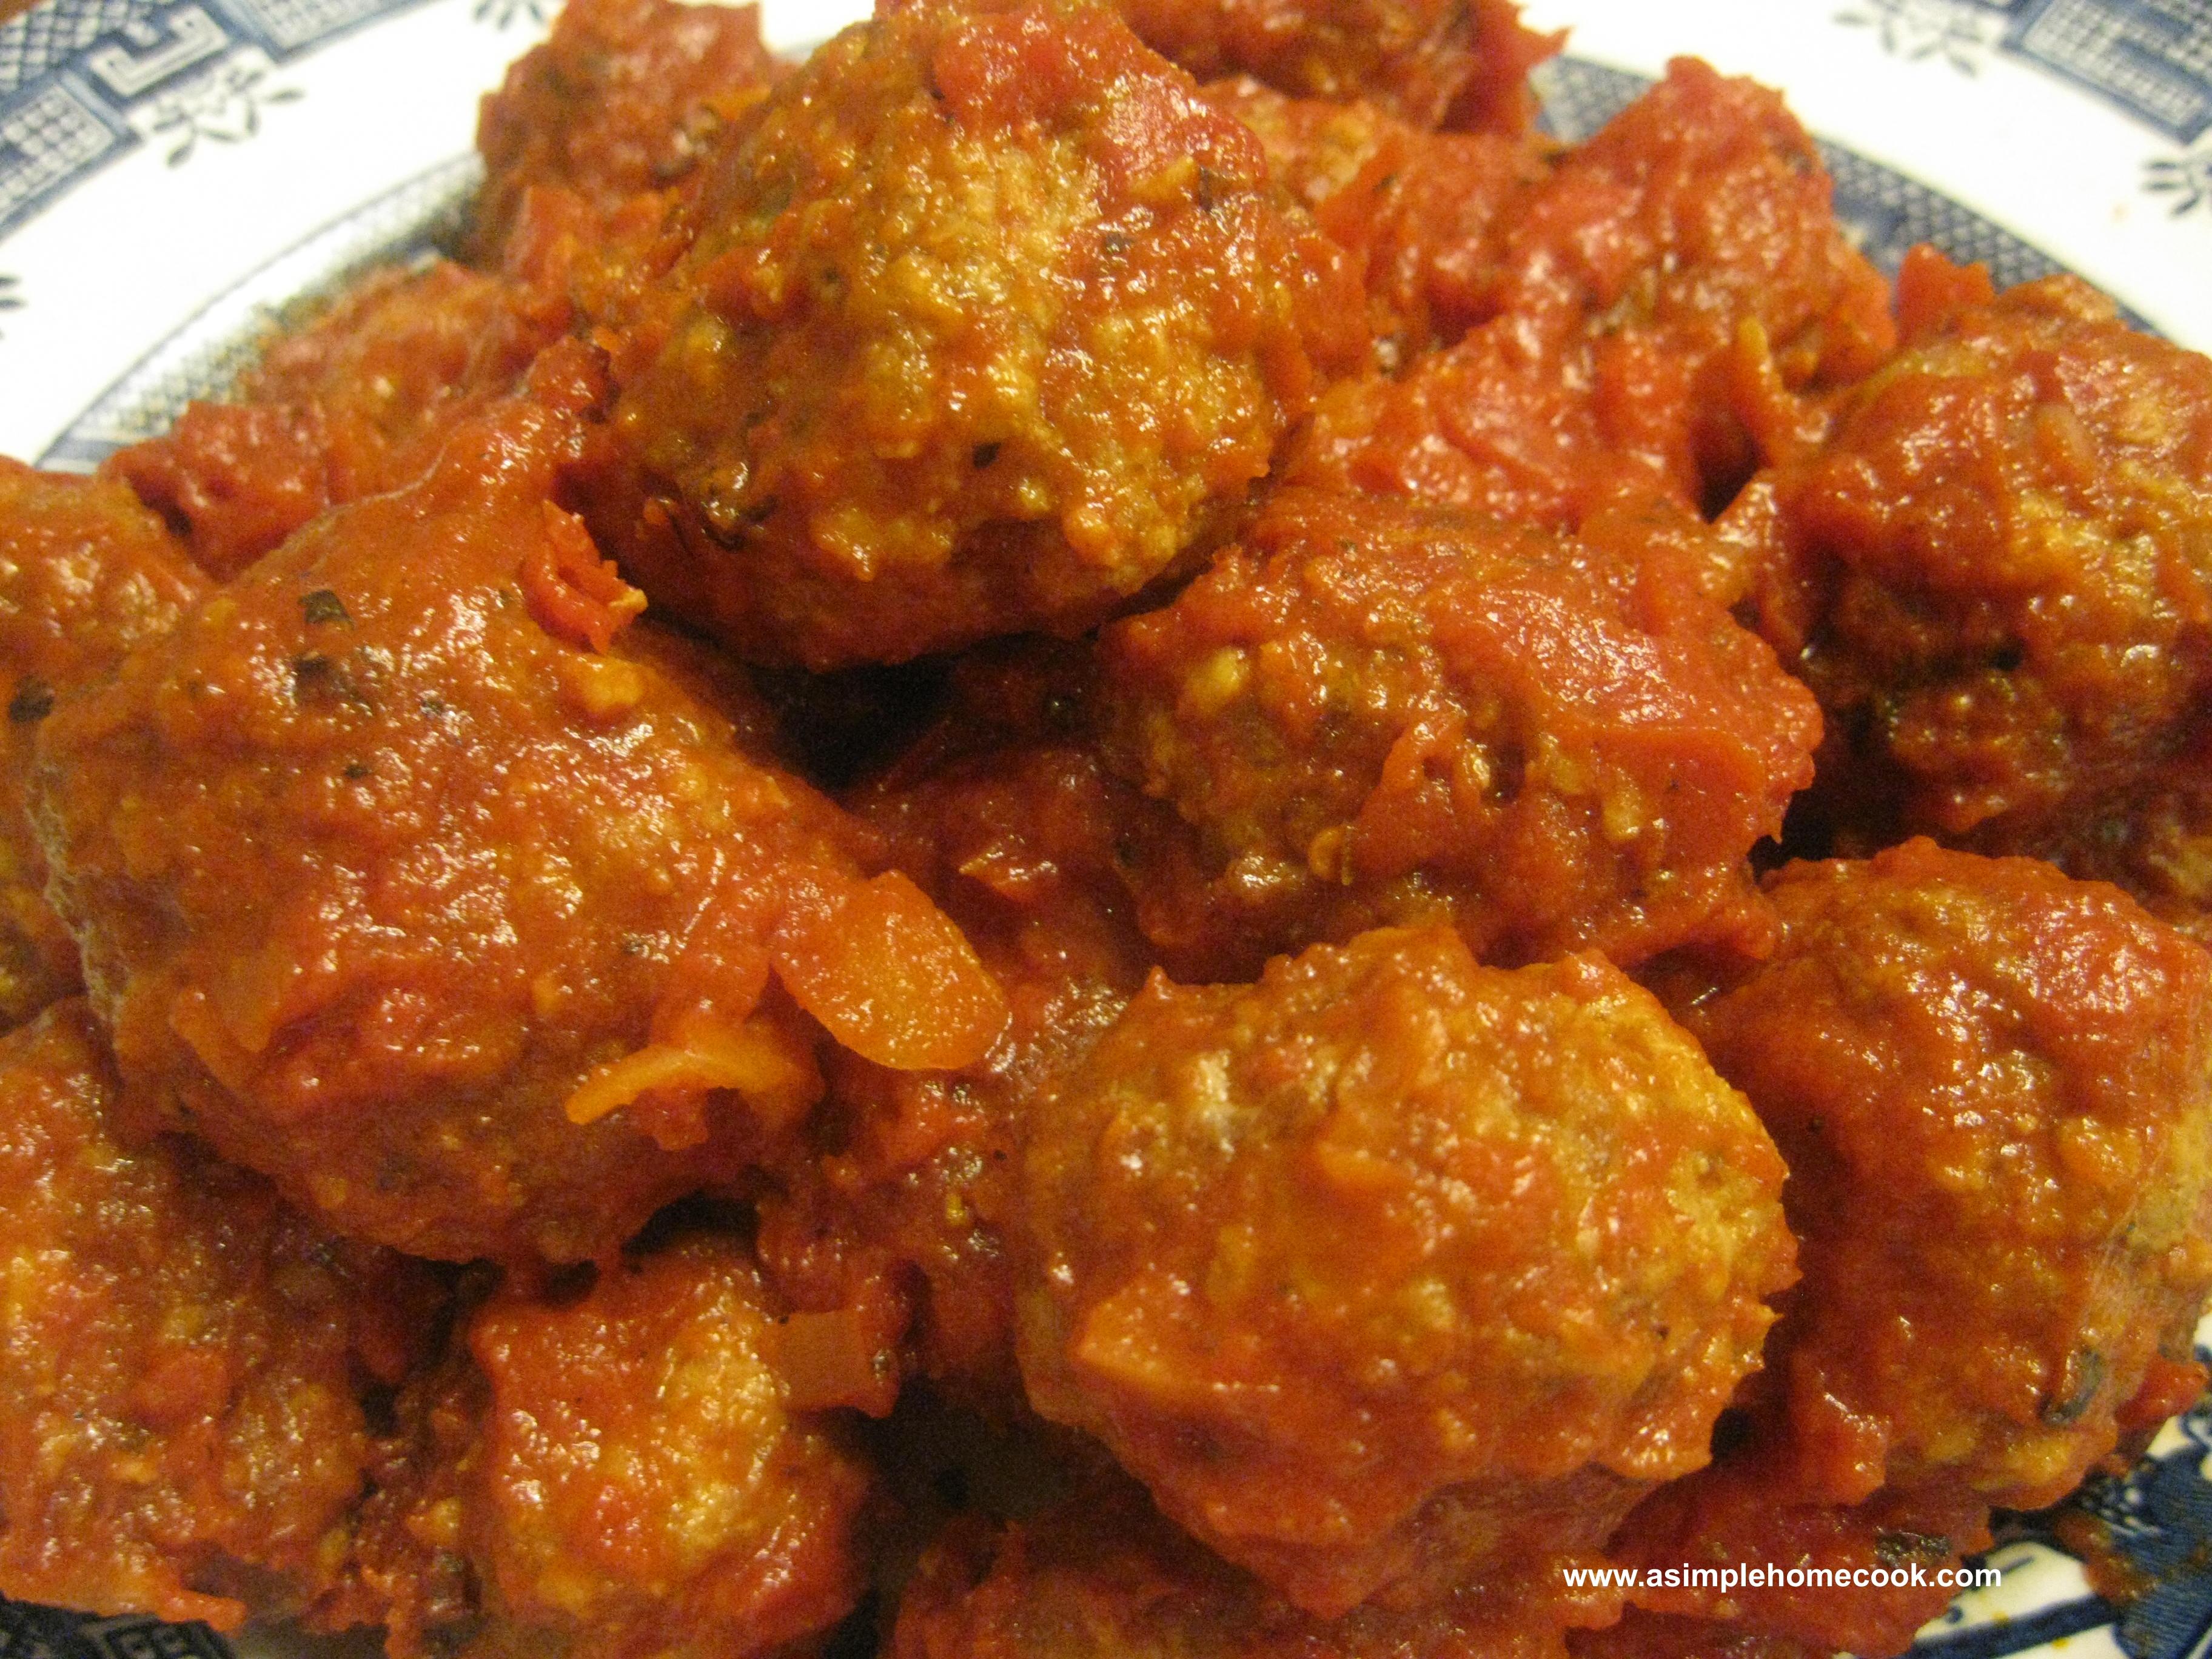 meatballs in tomato sauce final